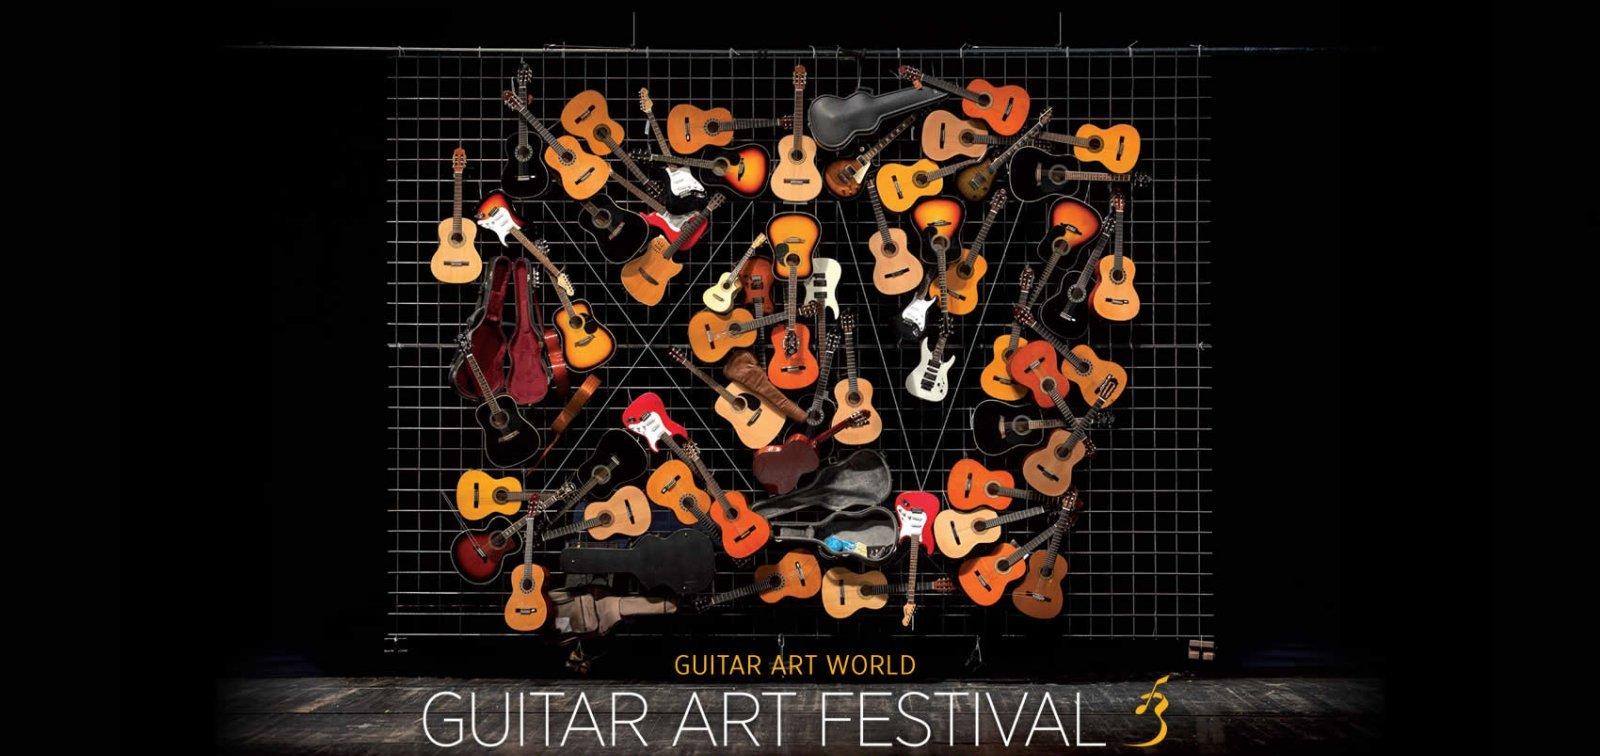 XIX Guitar Art Festival